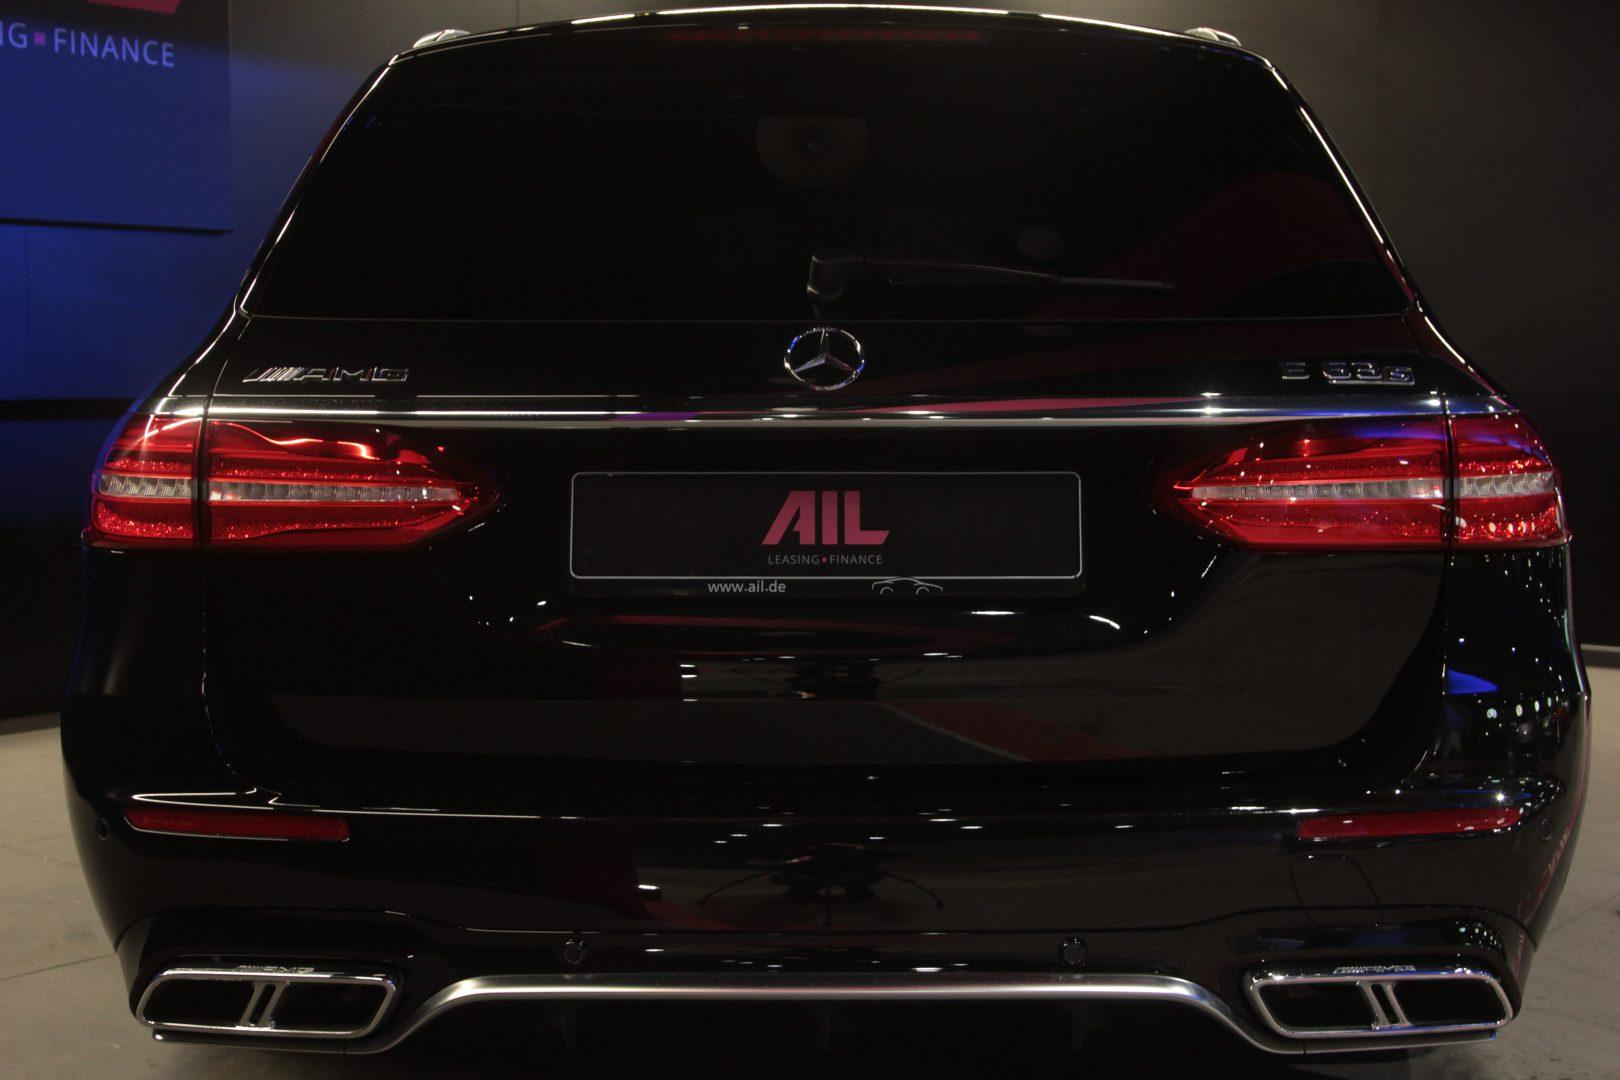 AIL Mercedes-Benz  E 63 AMG S 4Matic 8